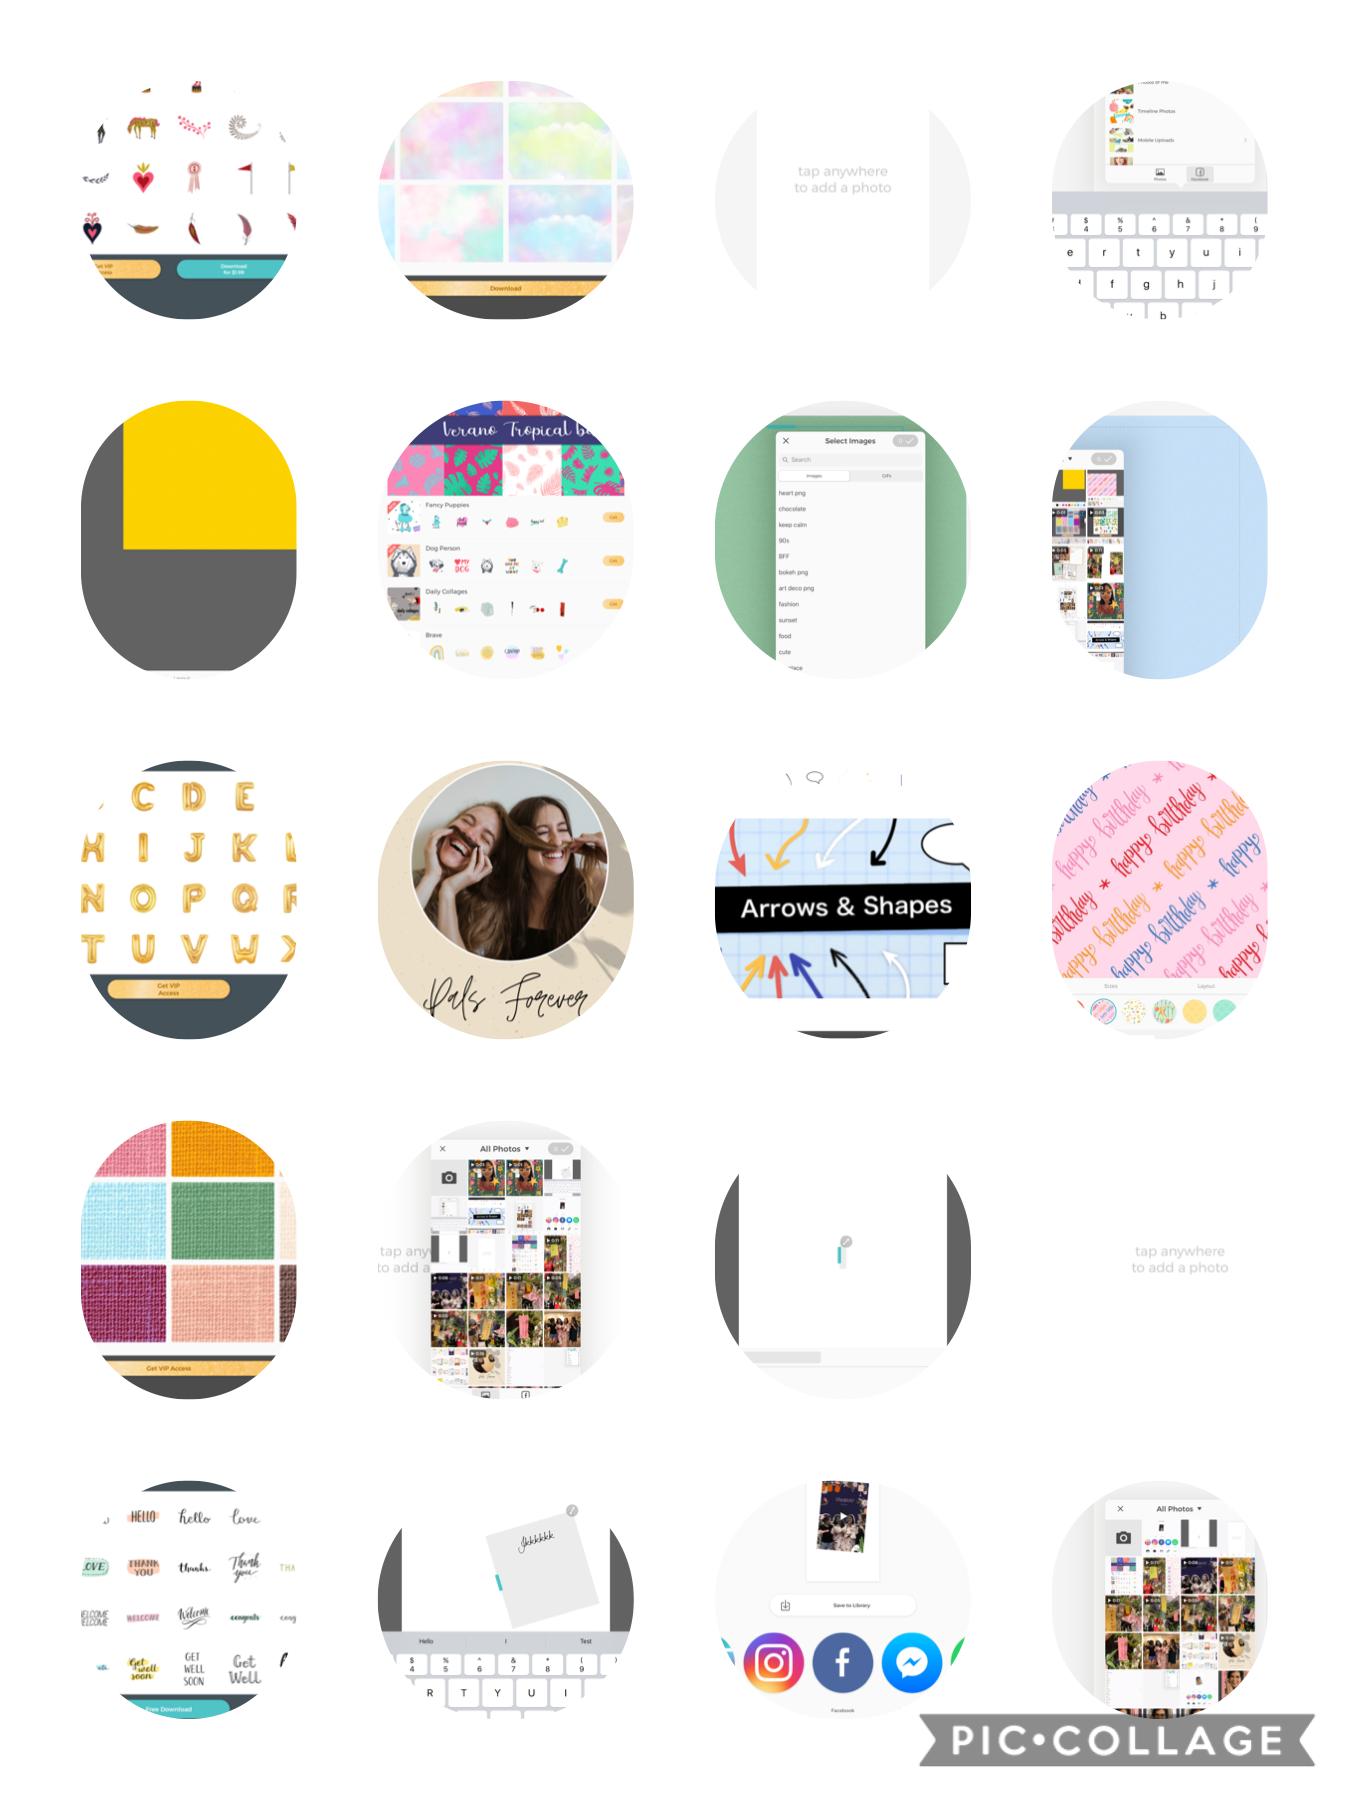 Collage by SerenaWaldorf